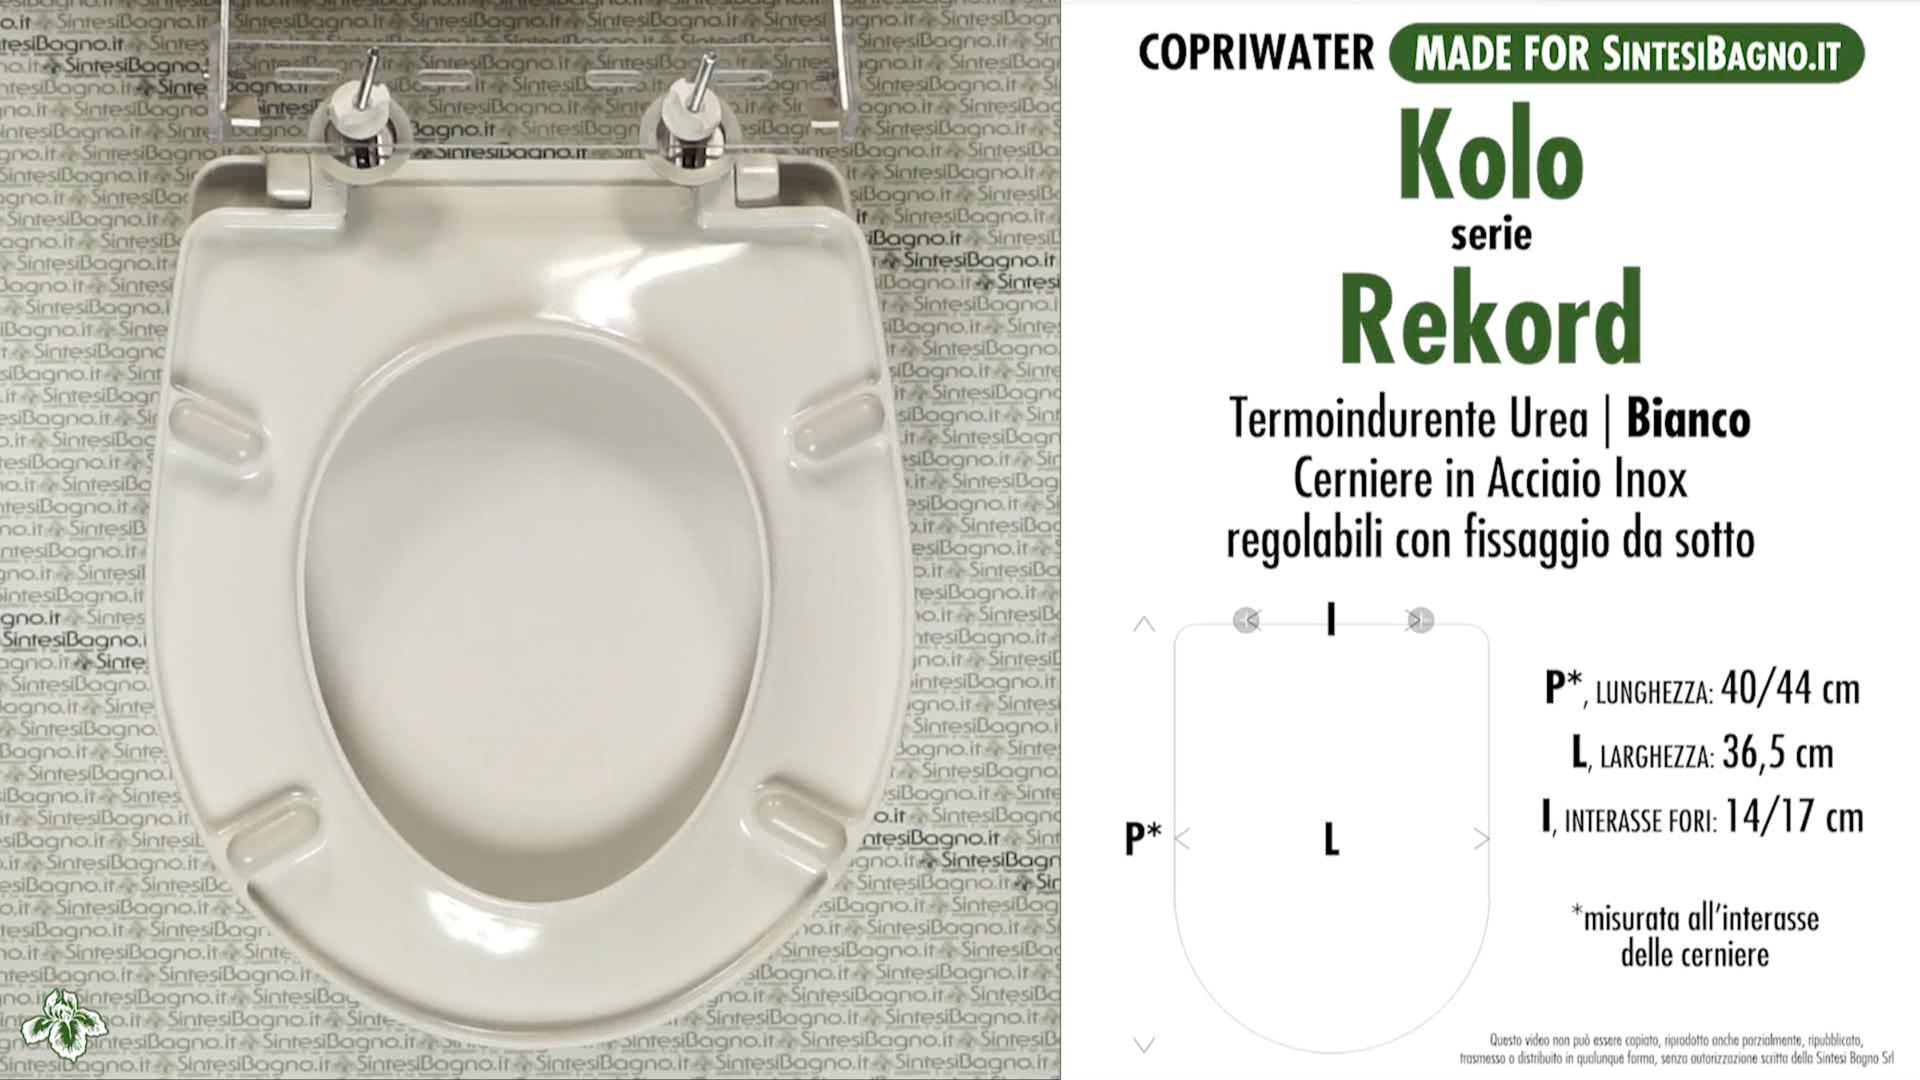 SCHEDA TECNICA MISURE copriwater KOLO REKORD